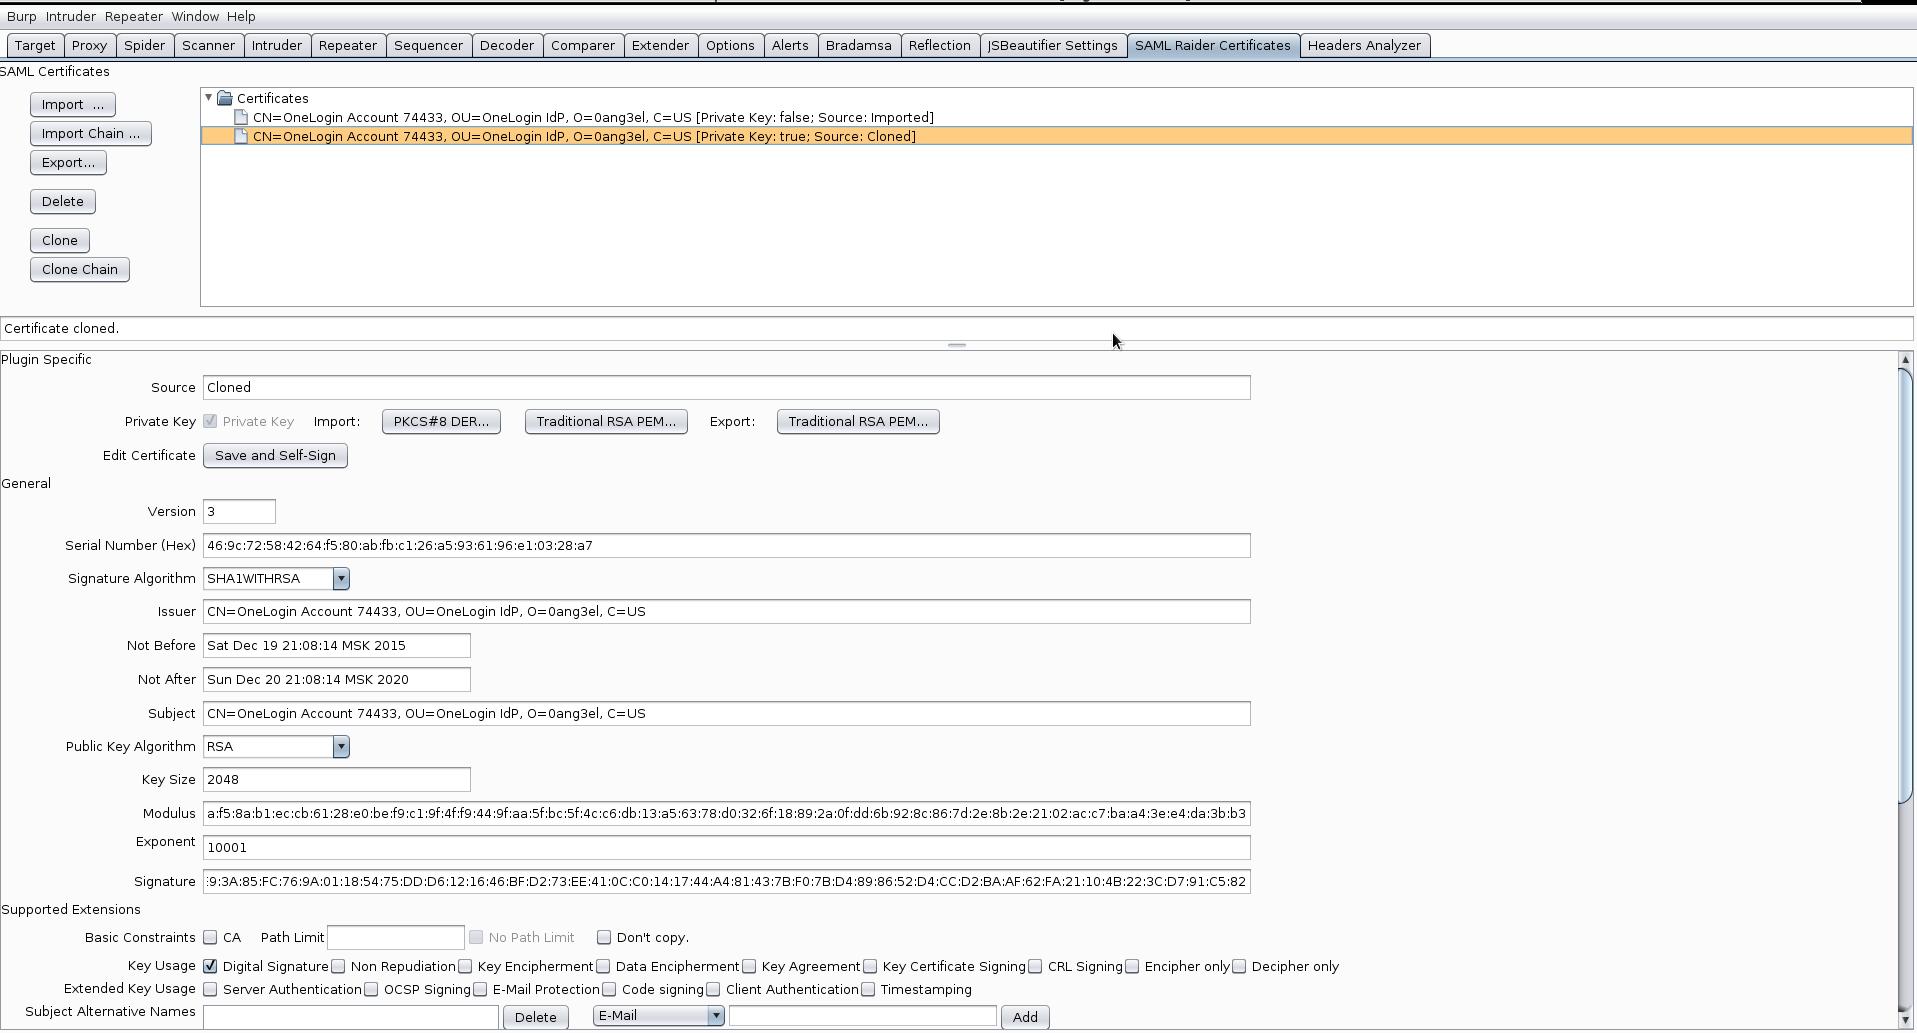 Рис. 14. SAML Raider Certificates tab